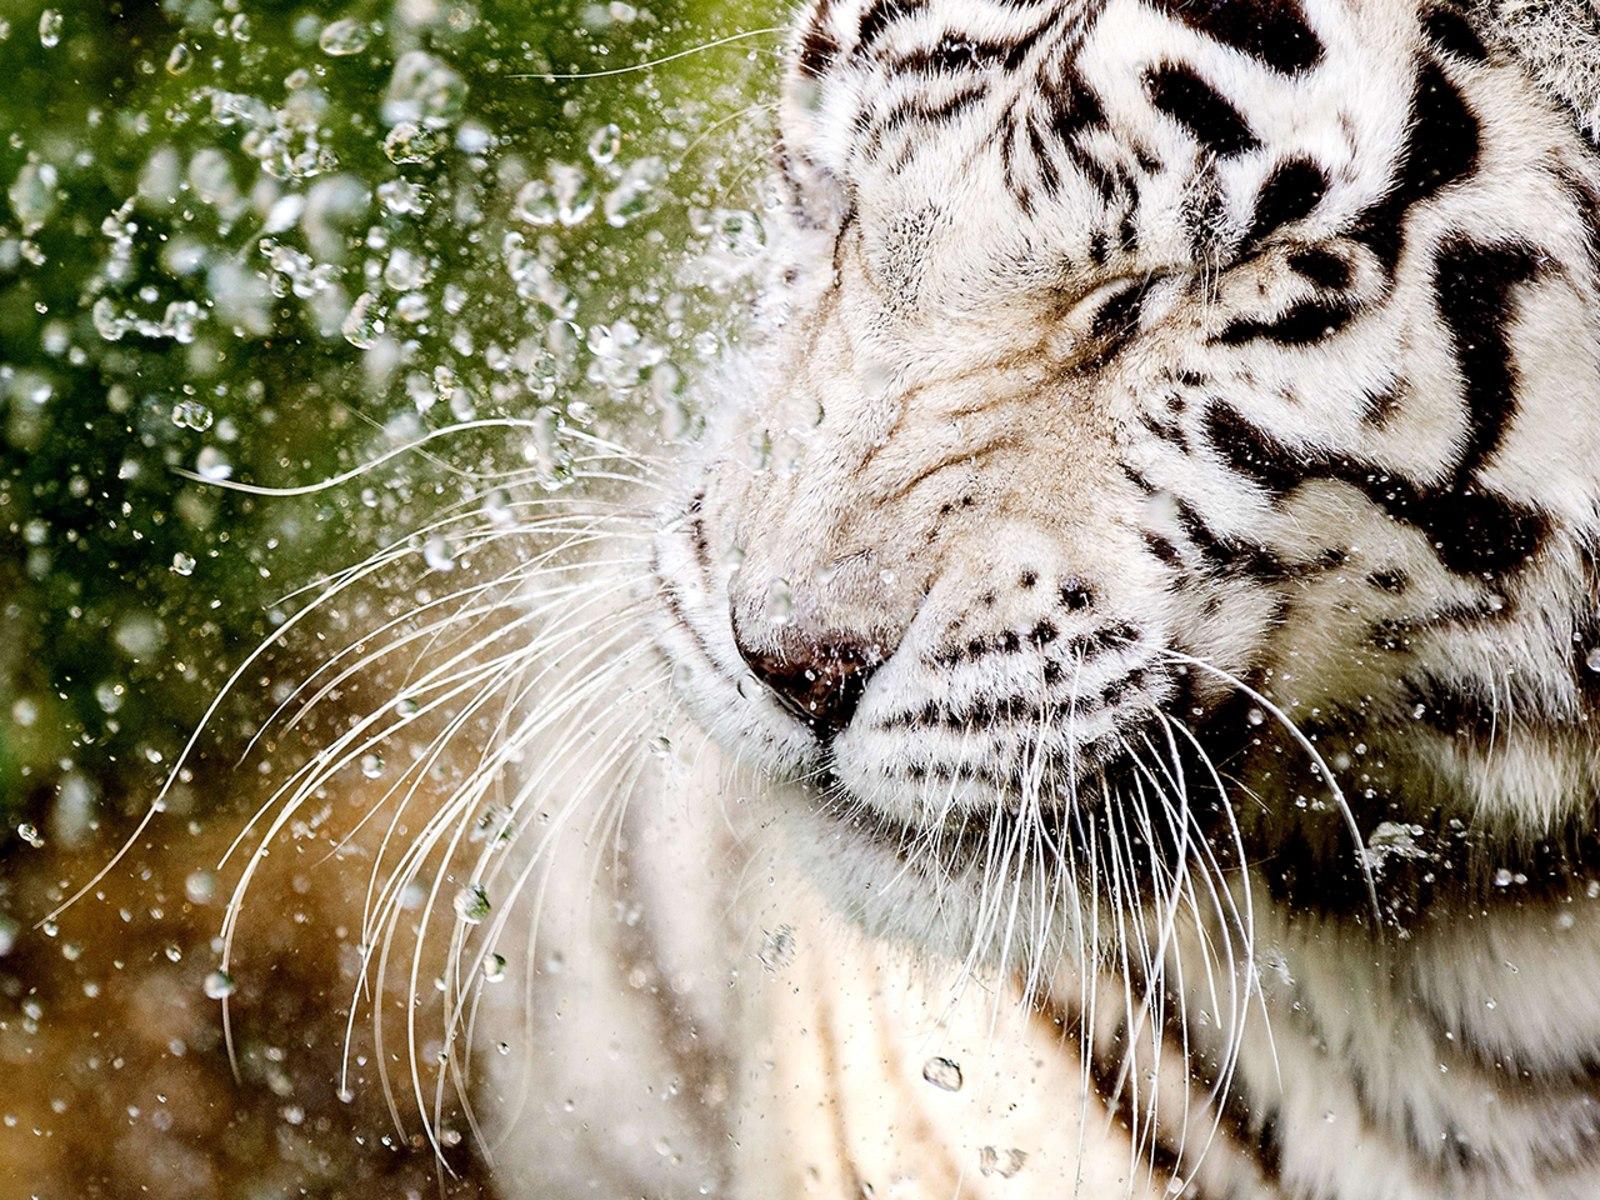 Image: NETHERLANDS-ANIMALS-ZOO